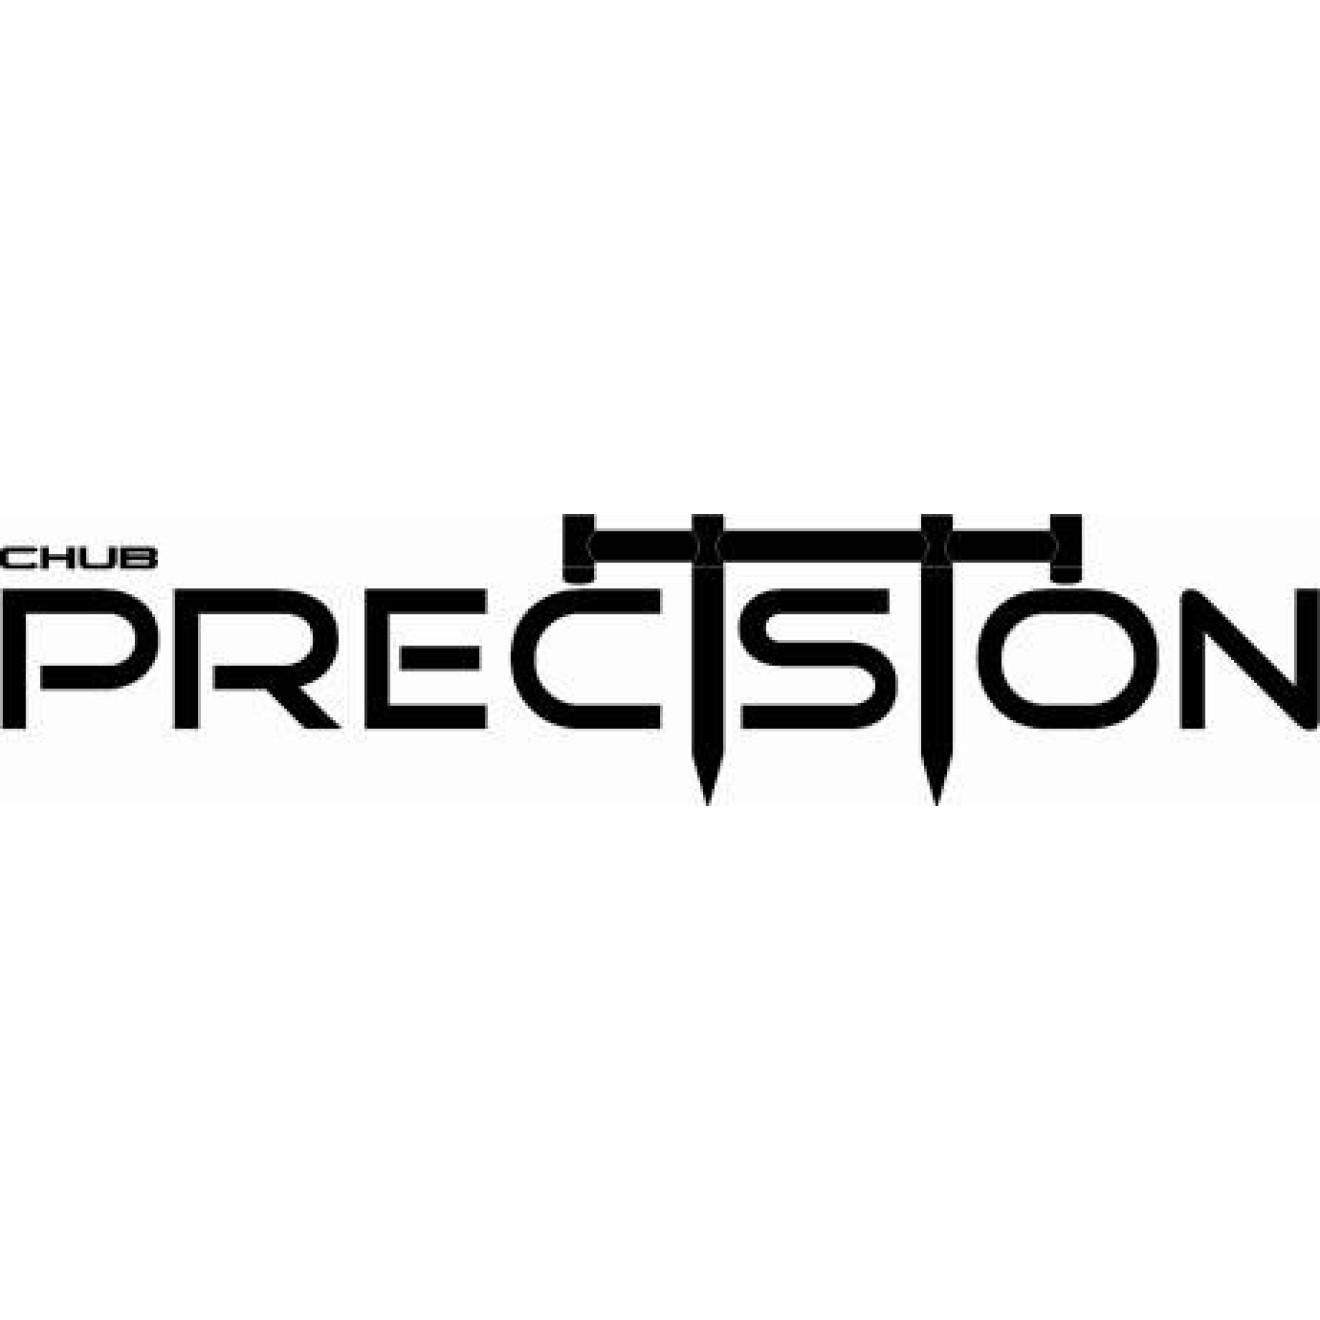 Chub Precision Lite 2//3 Rod Adjustable Buzz Bars 1325457 Buzzer Bar Buzzbars